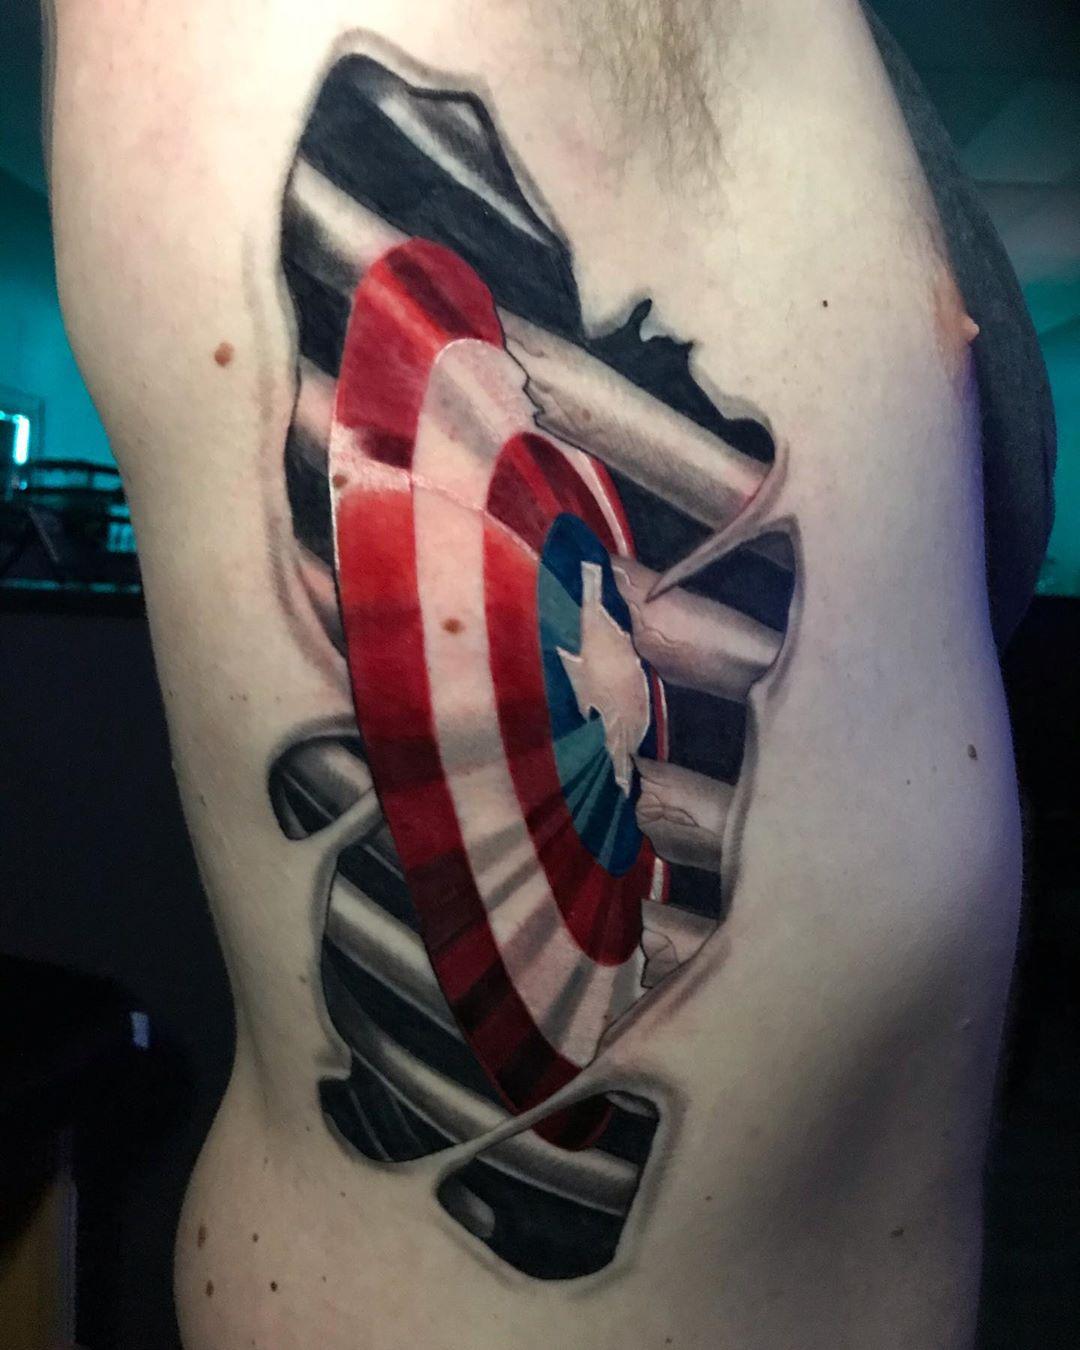 Captain America's shield in ribcage tattoo